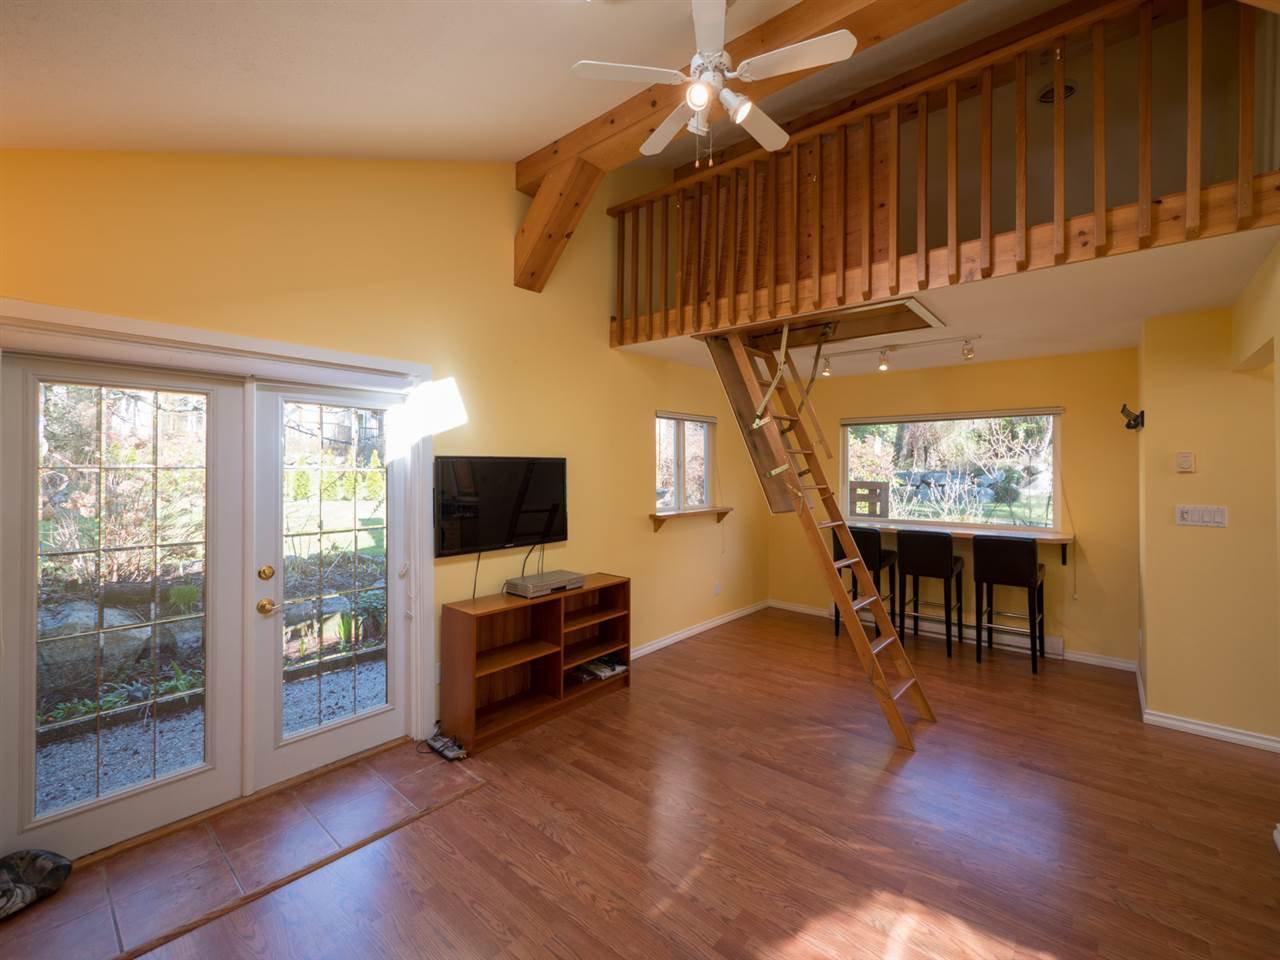 Photo 11: Photos: 3592 BEACH Avenue: Roberts Creek House for sale (Sunshine Coast)  : MLS®# R2244747